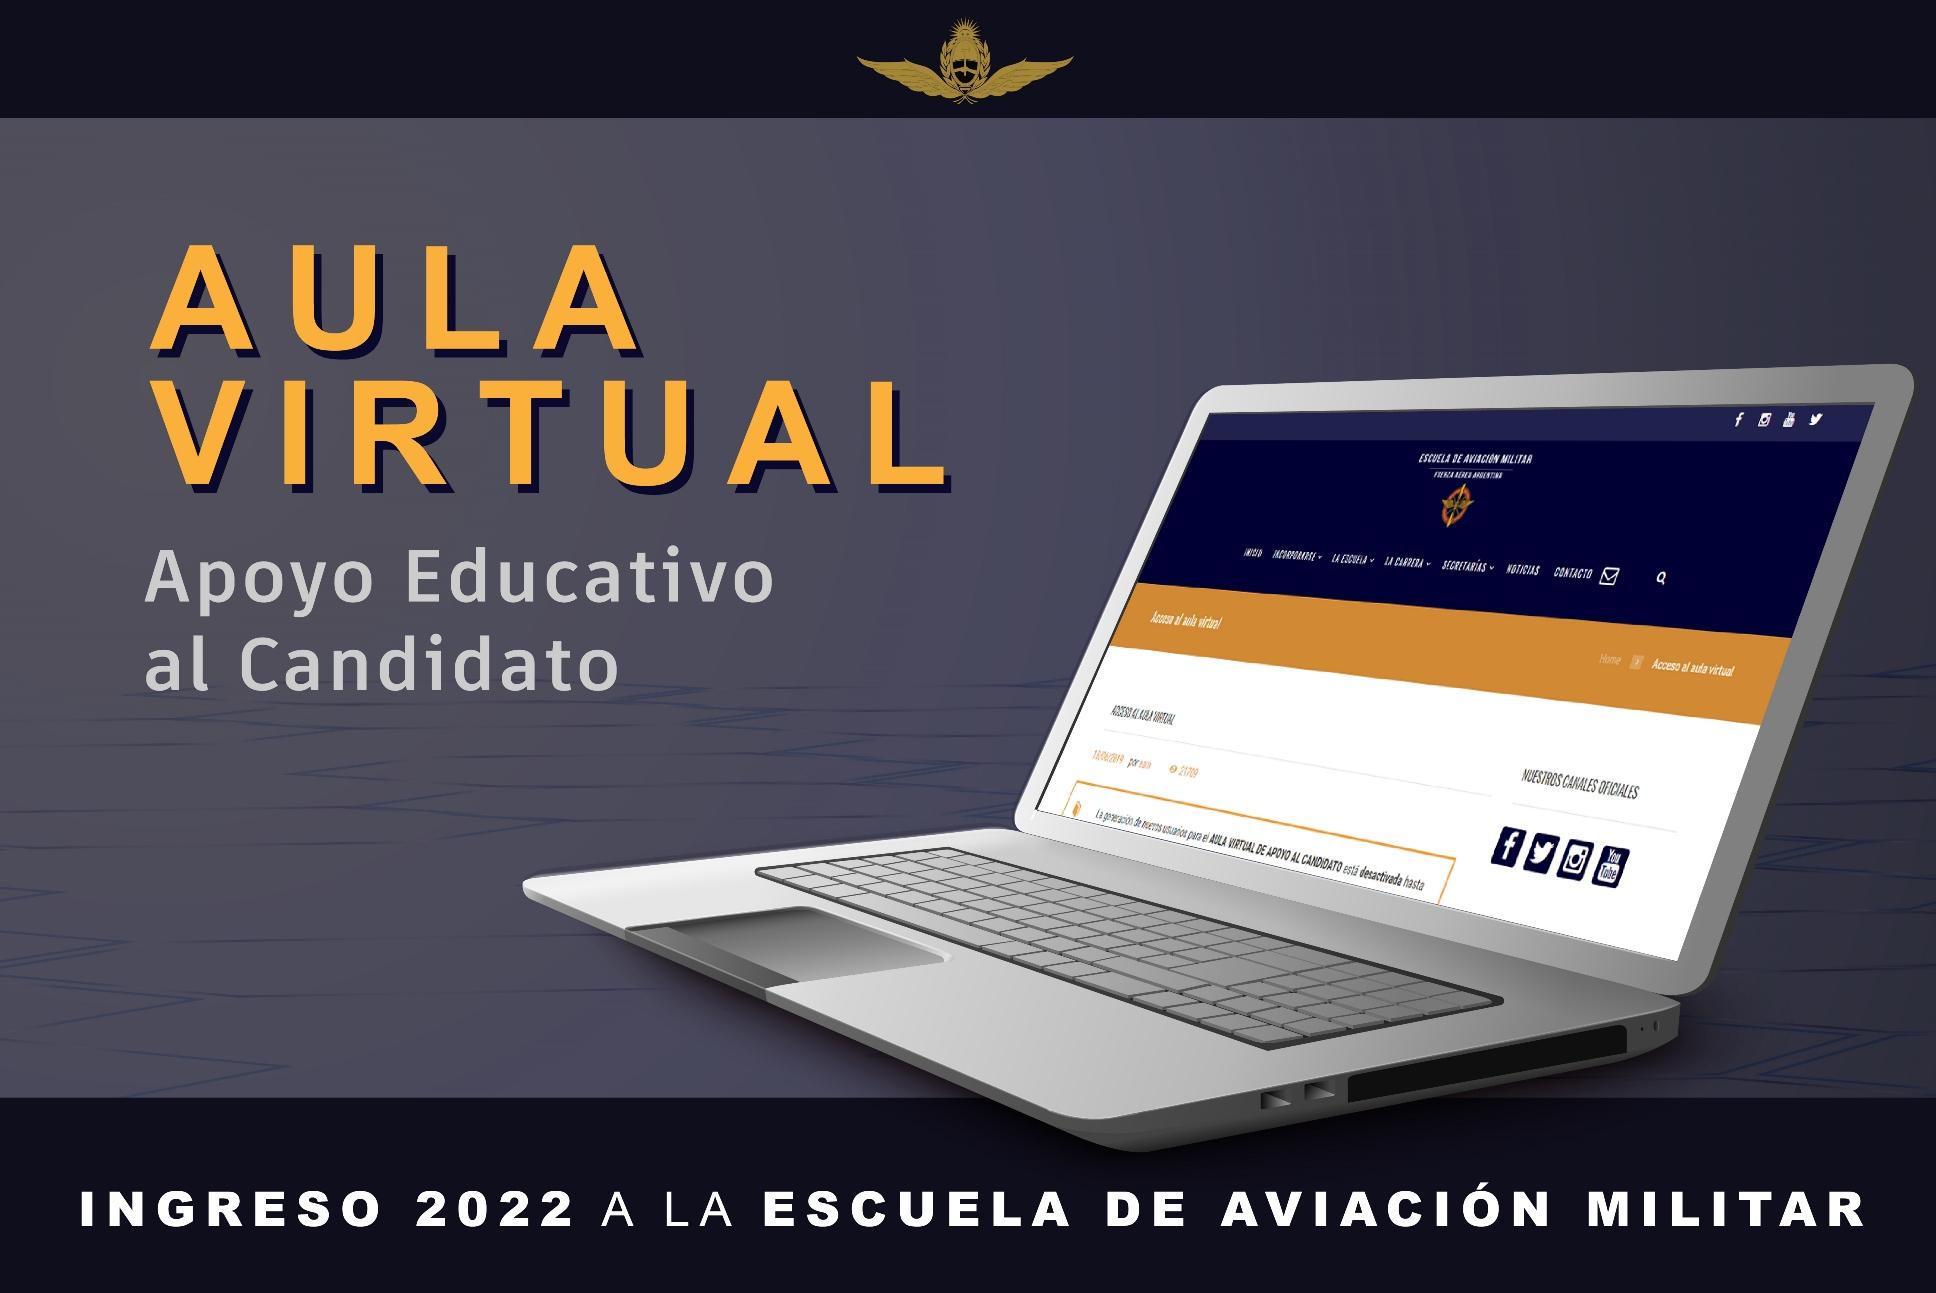 aula-virtual_index.jpg